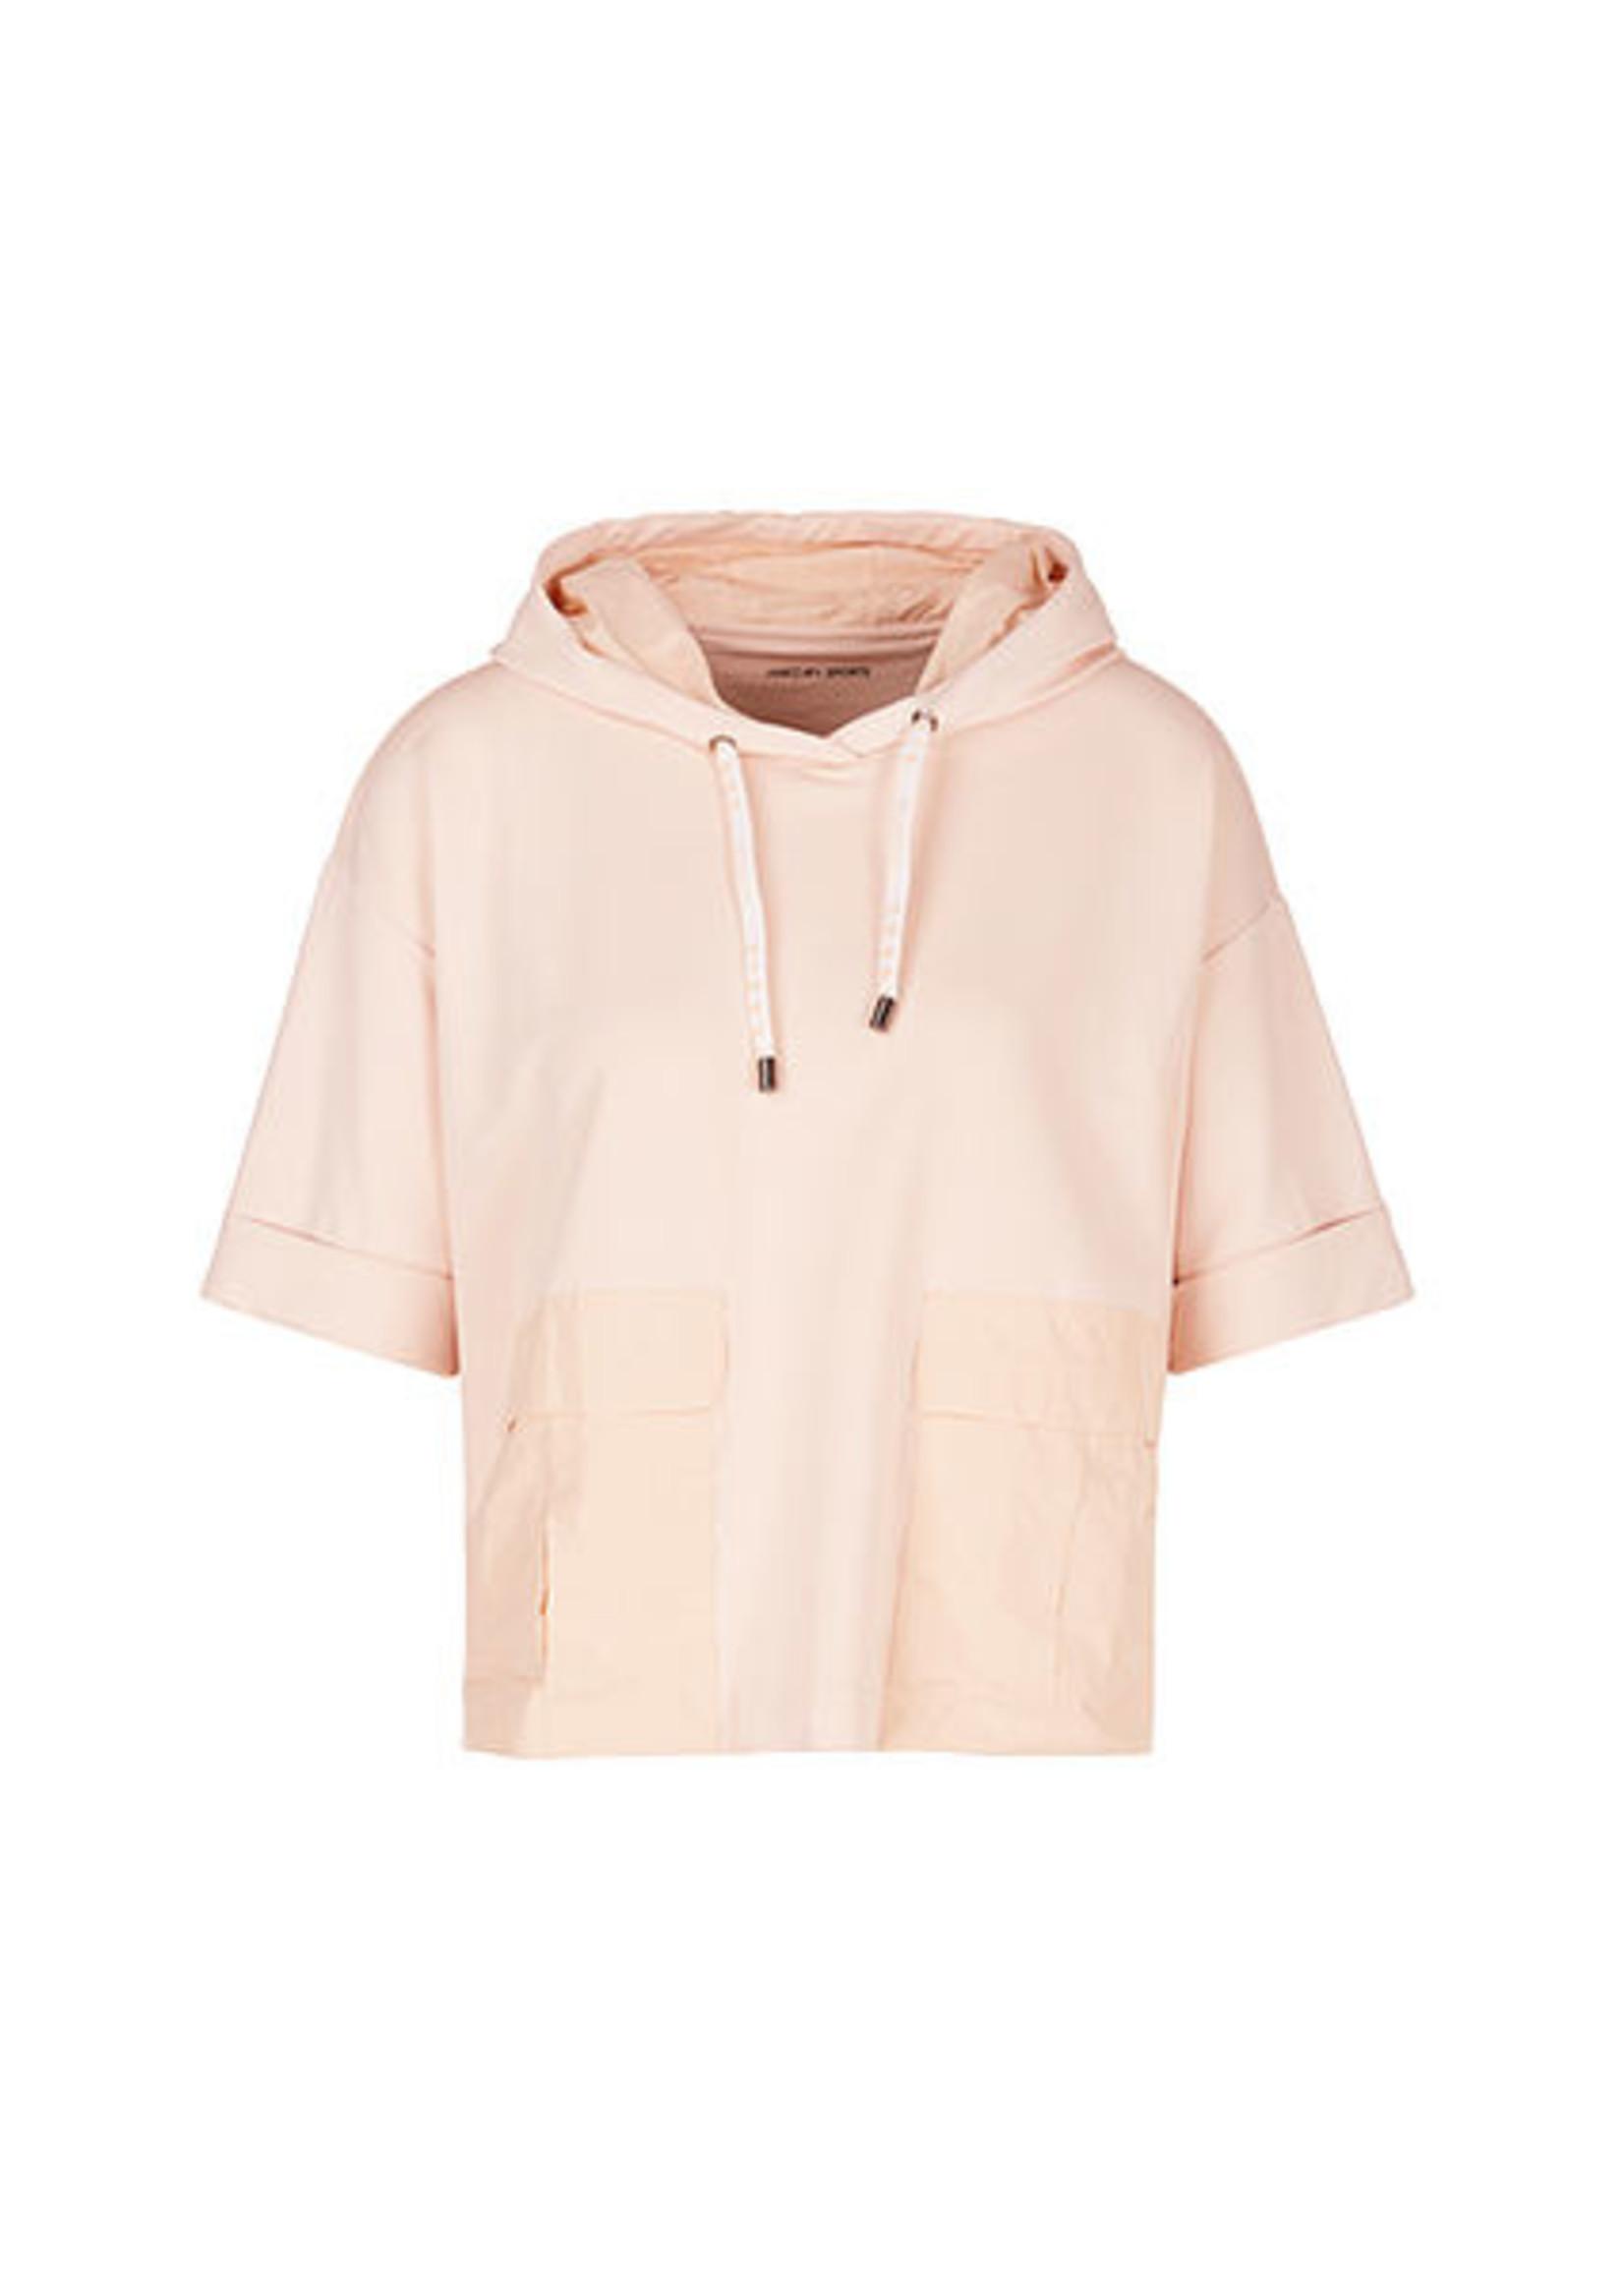 Sweater QS 44.07 J26